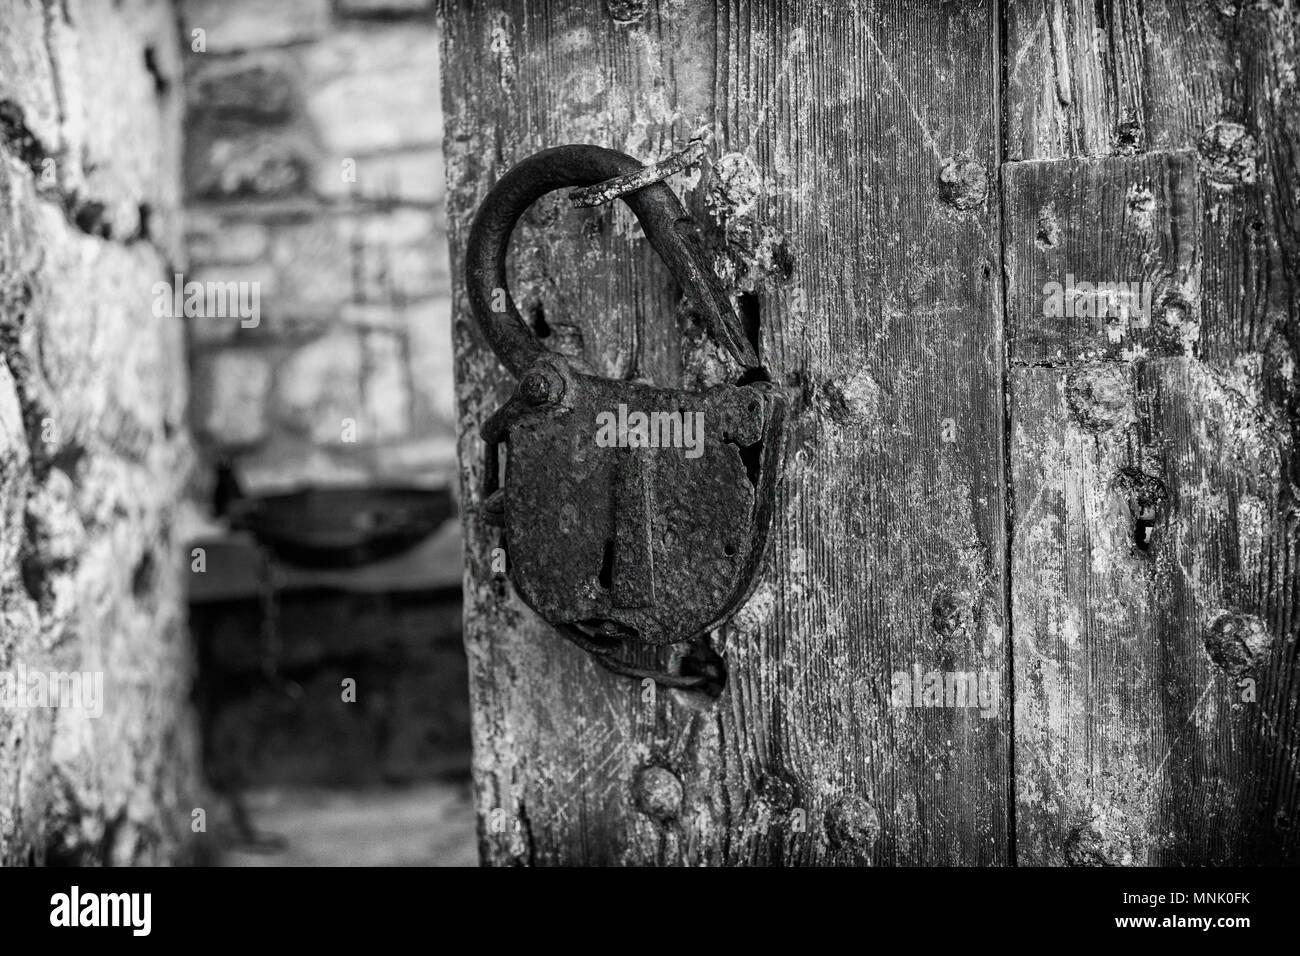 Rusty old padlock - Stock Image